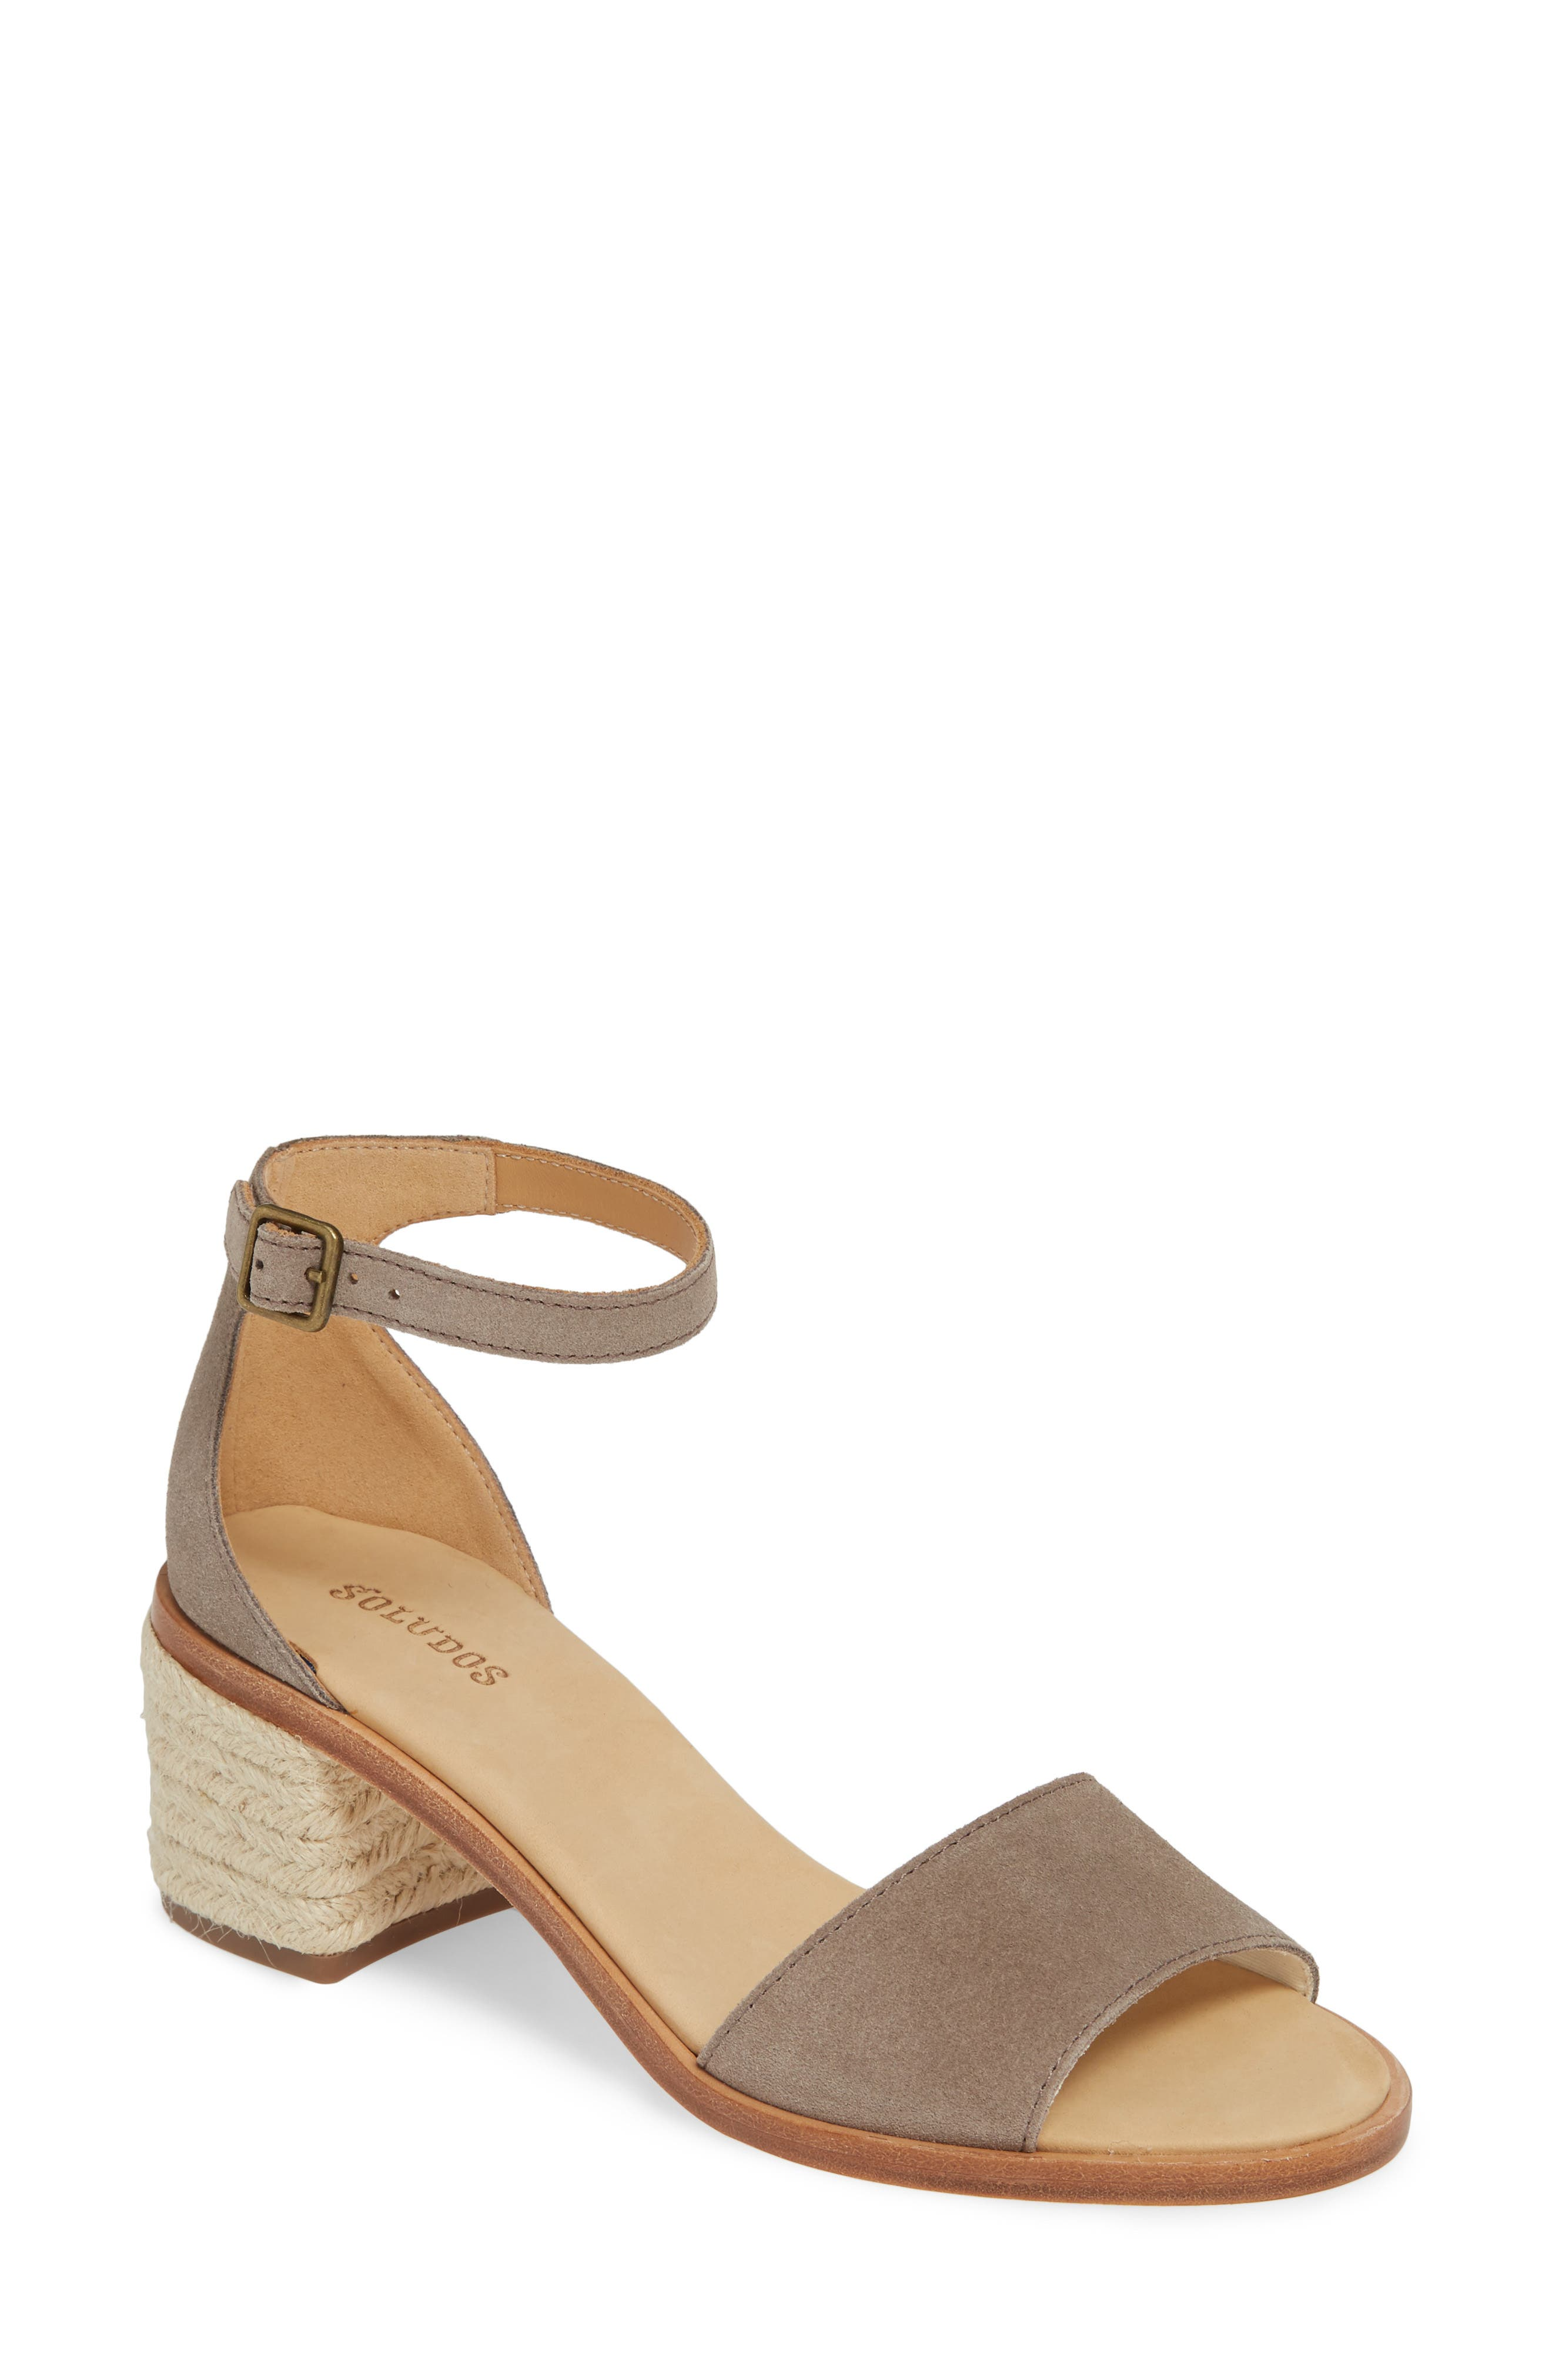 SOLUDOS Capri Espadrille Heel Sandal, Main, color, ASH